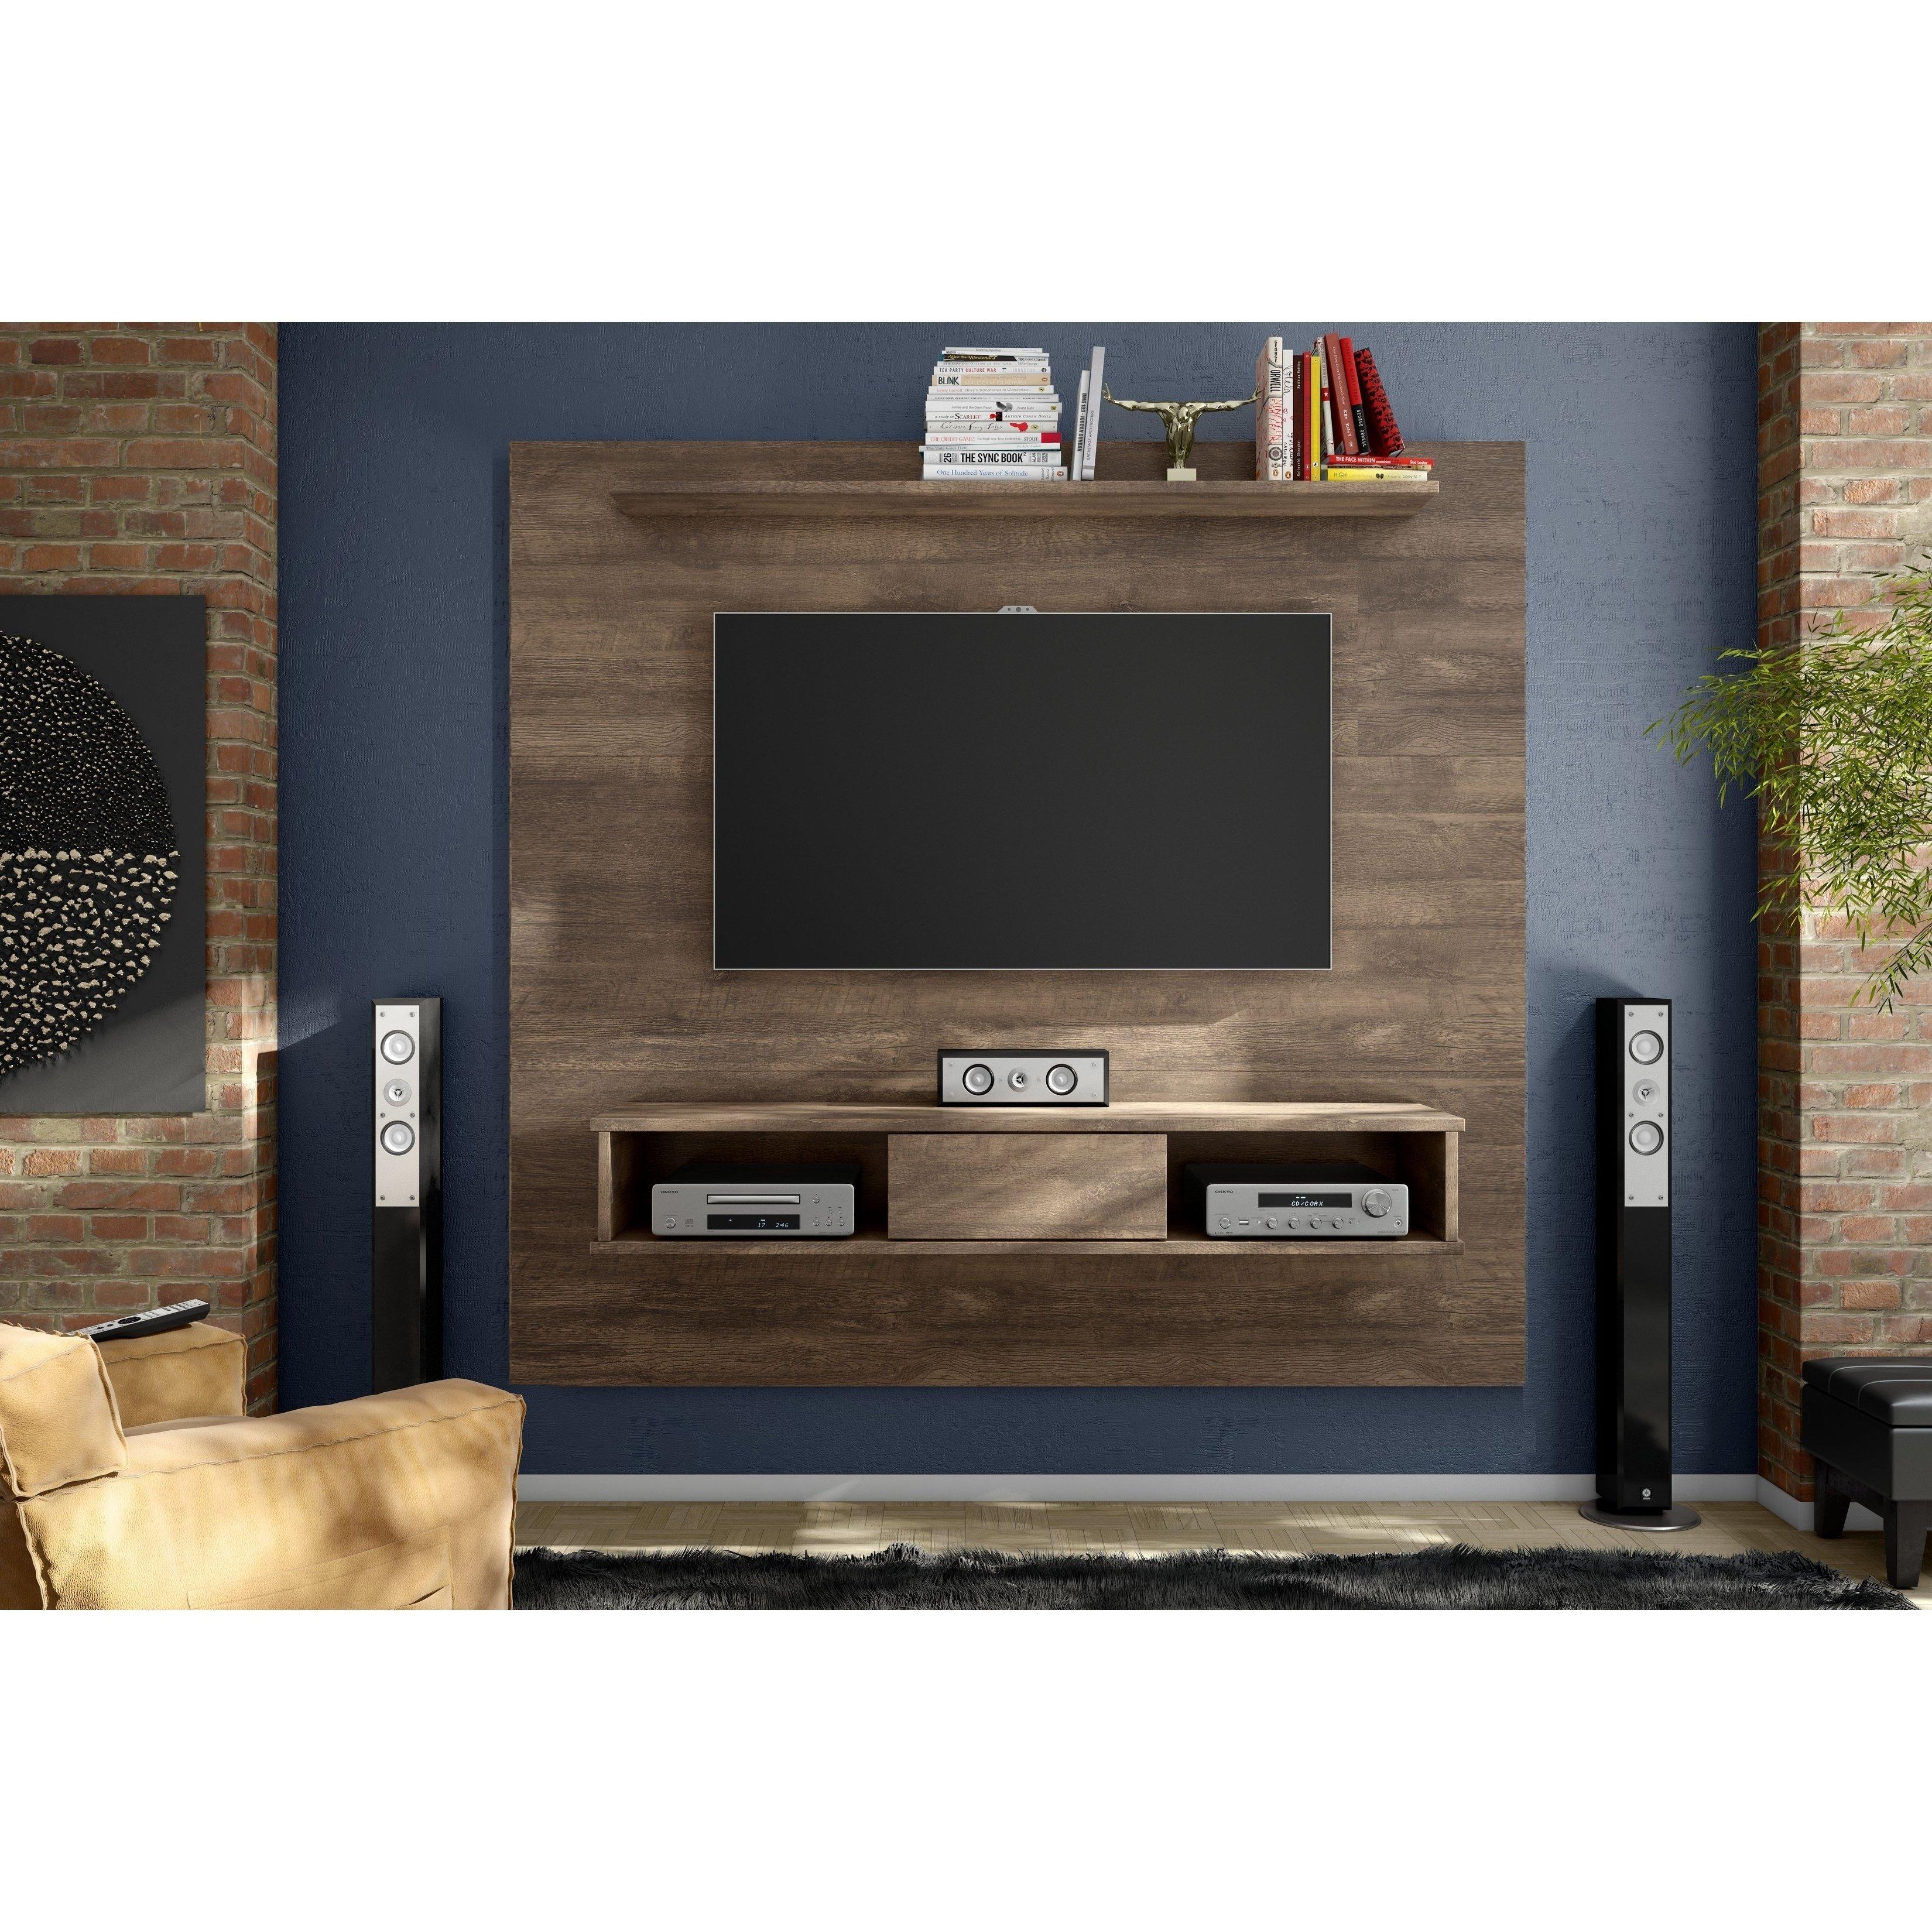 Shop Strick & Bolton Waller Mid Century 2 Shelf 70 Inch Tv Board Inside Walton 60 Inch Tv Stands (View 22 of 30)